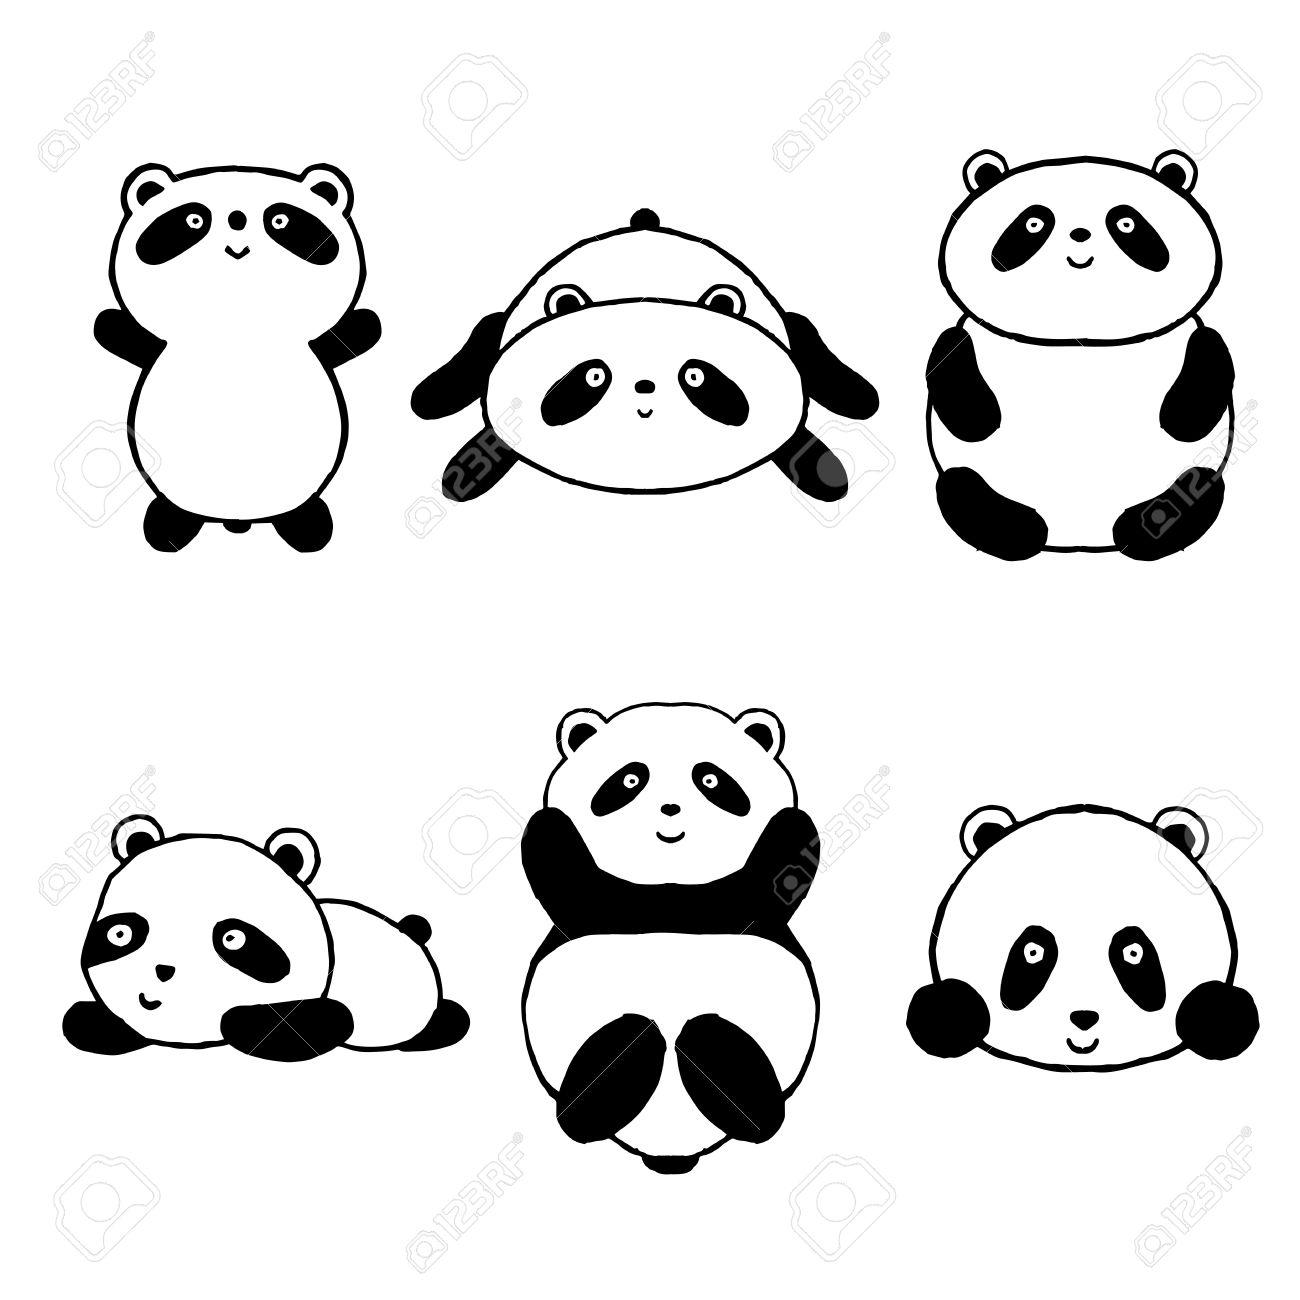 cute cartoon panda set icons black white hand drawn doodle animal